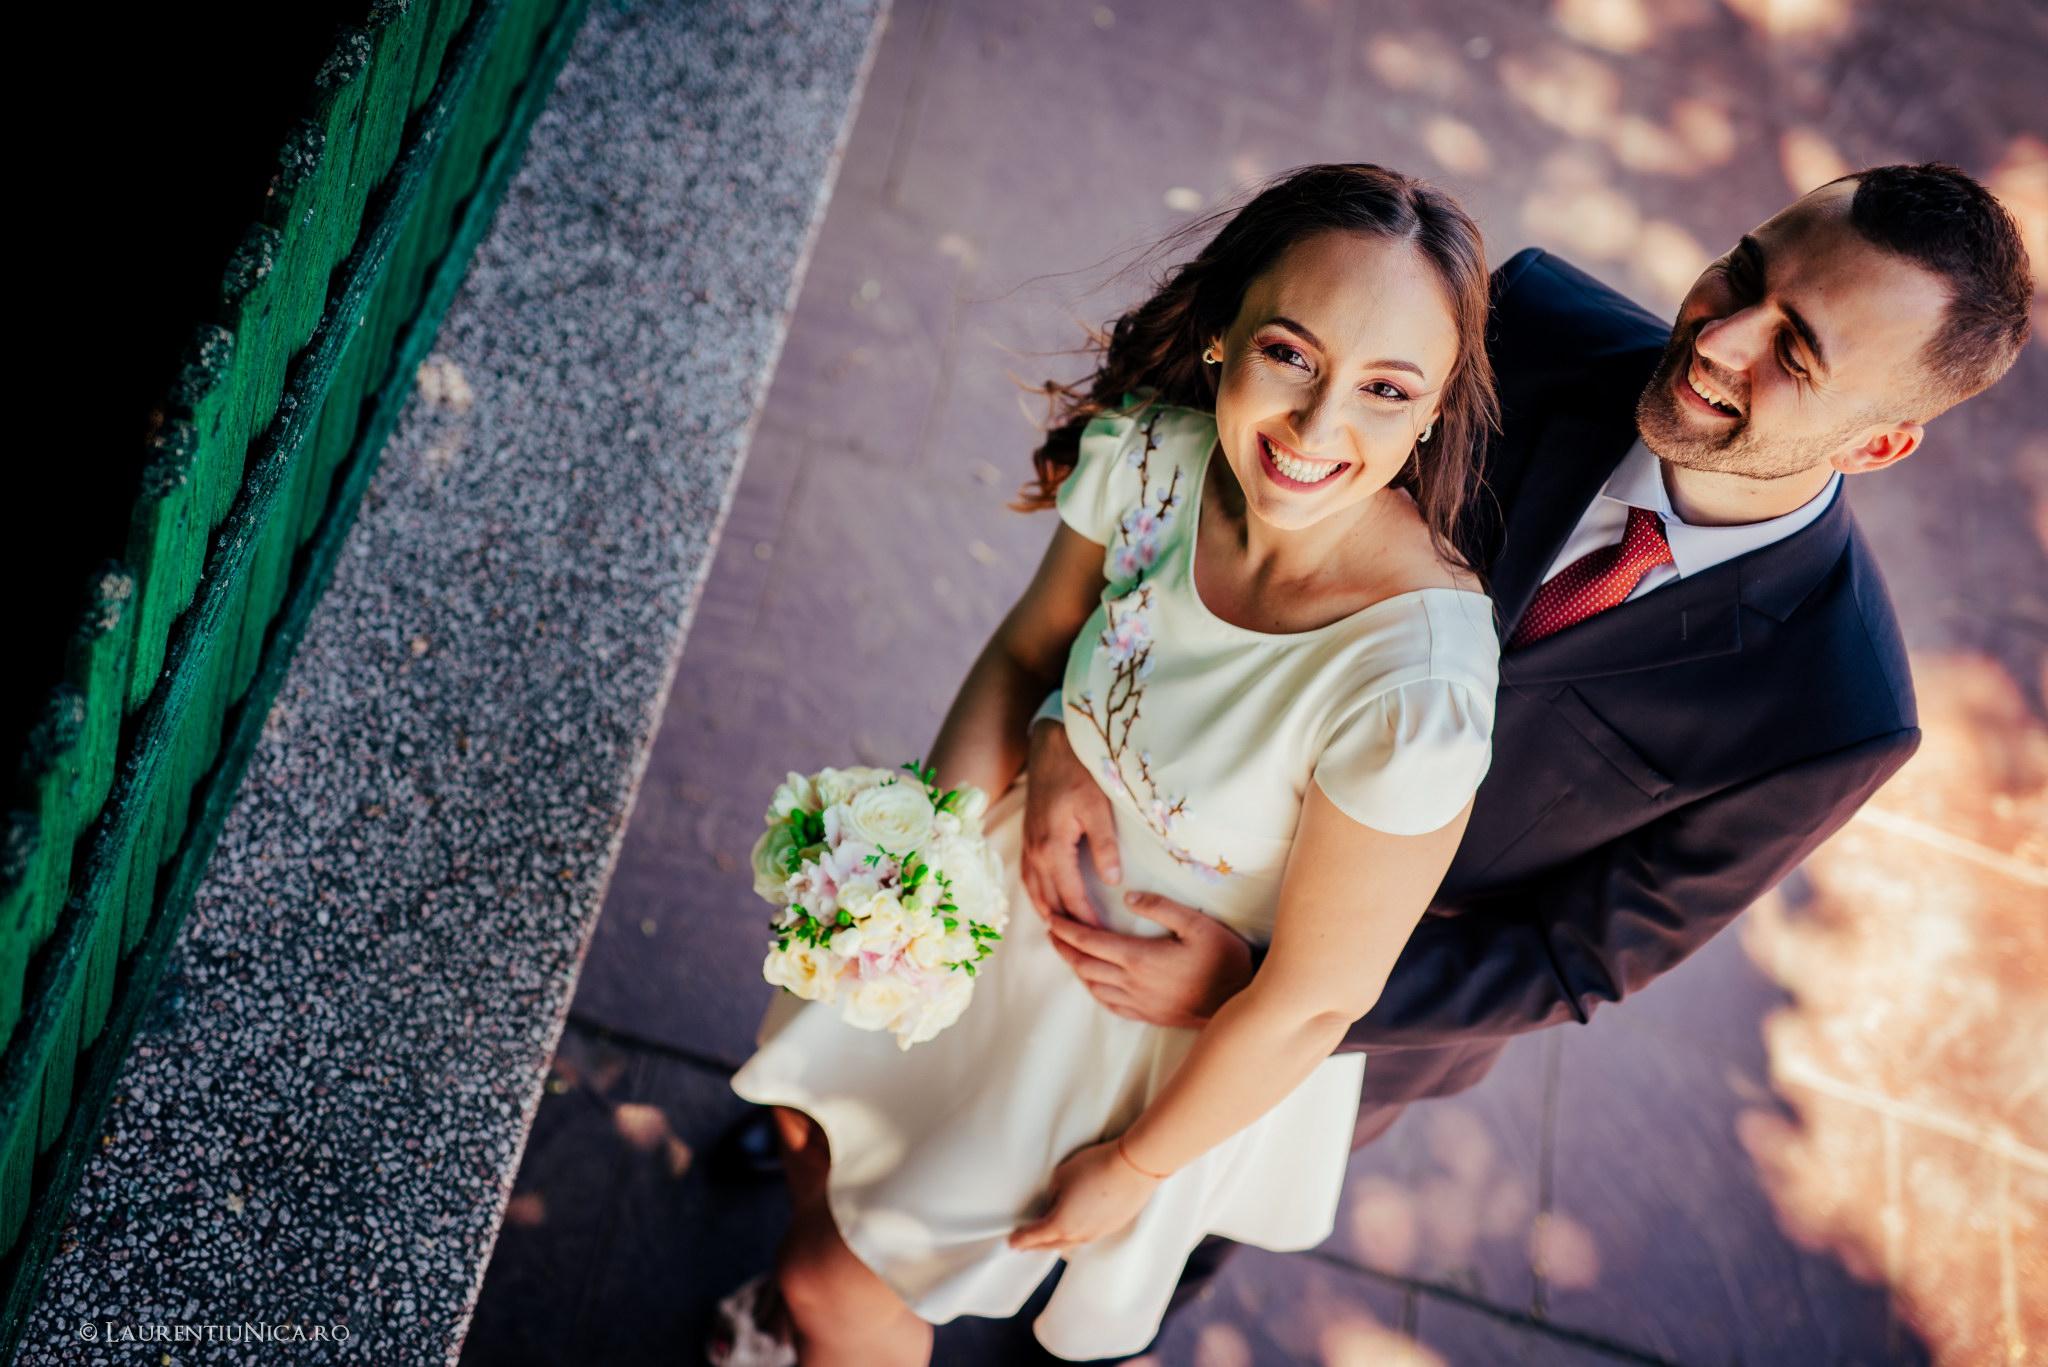 daiana si madalin fotograf nunta laurentiu nica targu jiu gorj 02 - Daiana & Madalin | Fotografii nunta | Targu-Jiu | Gorj